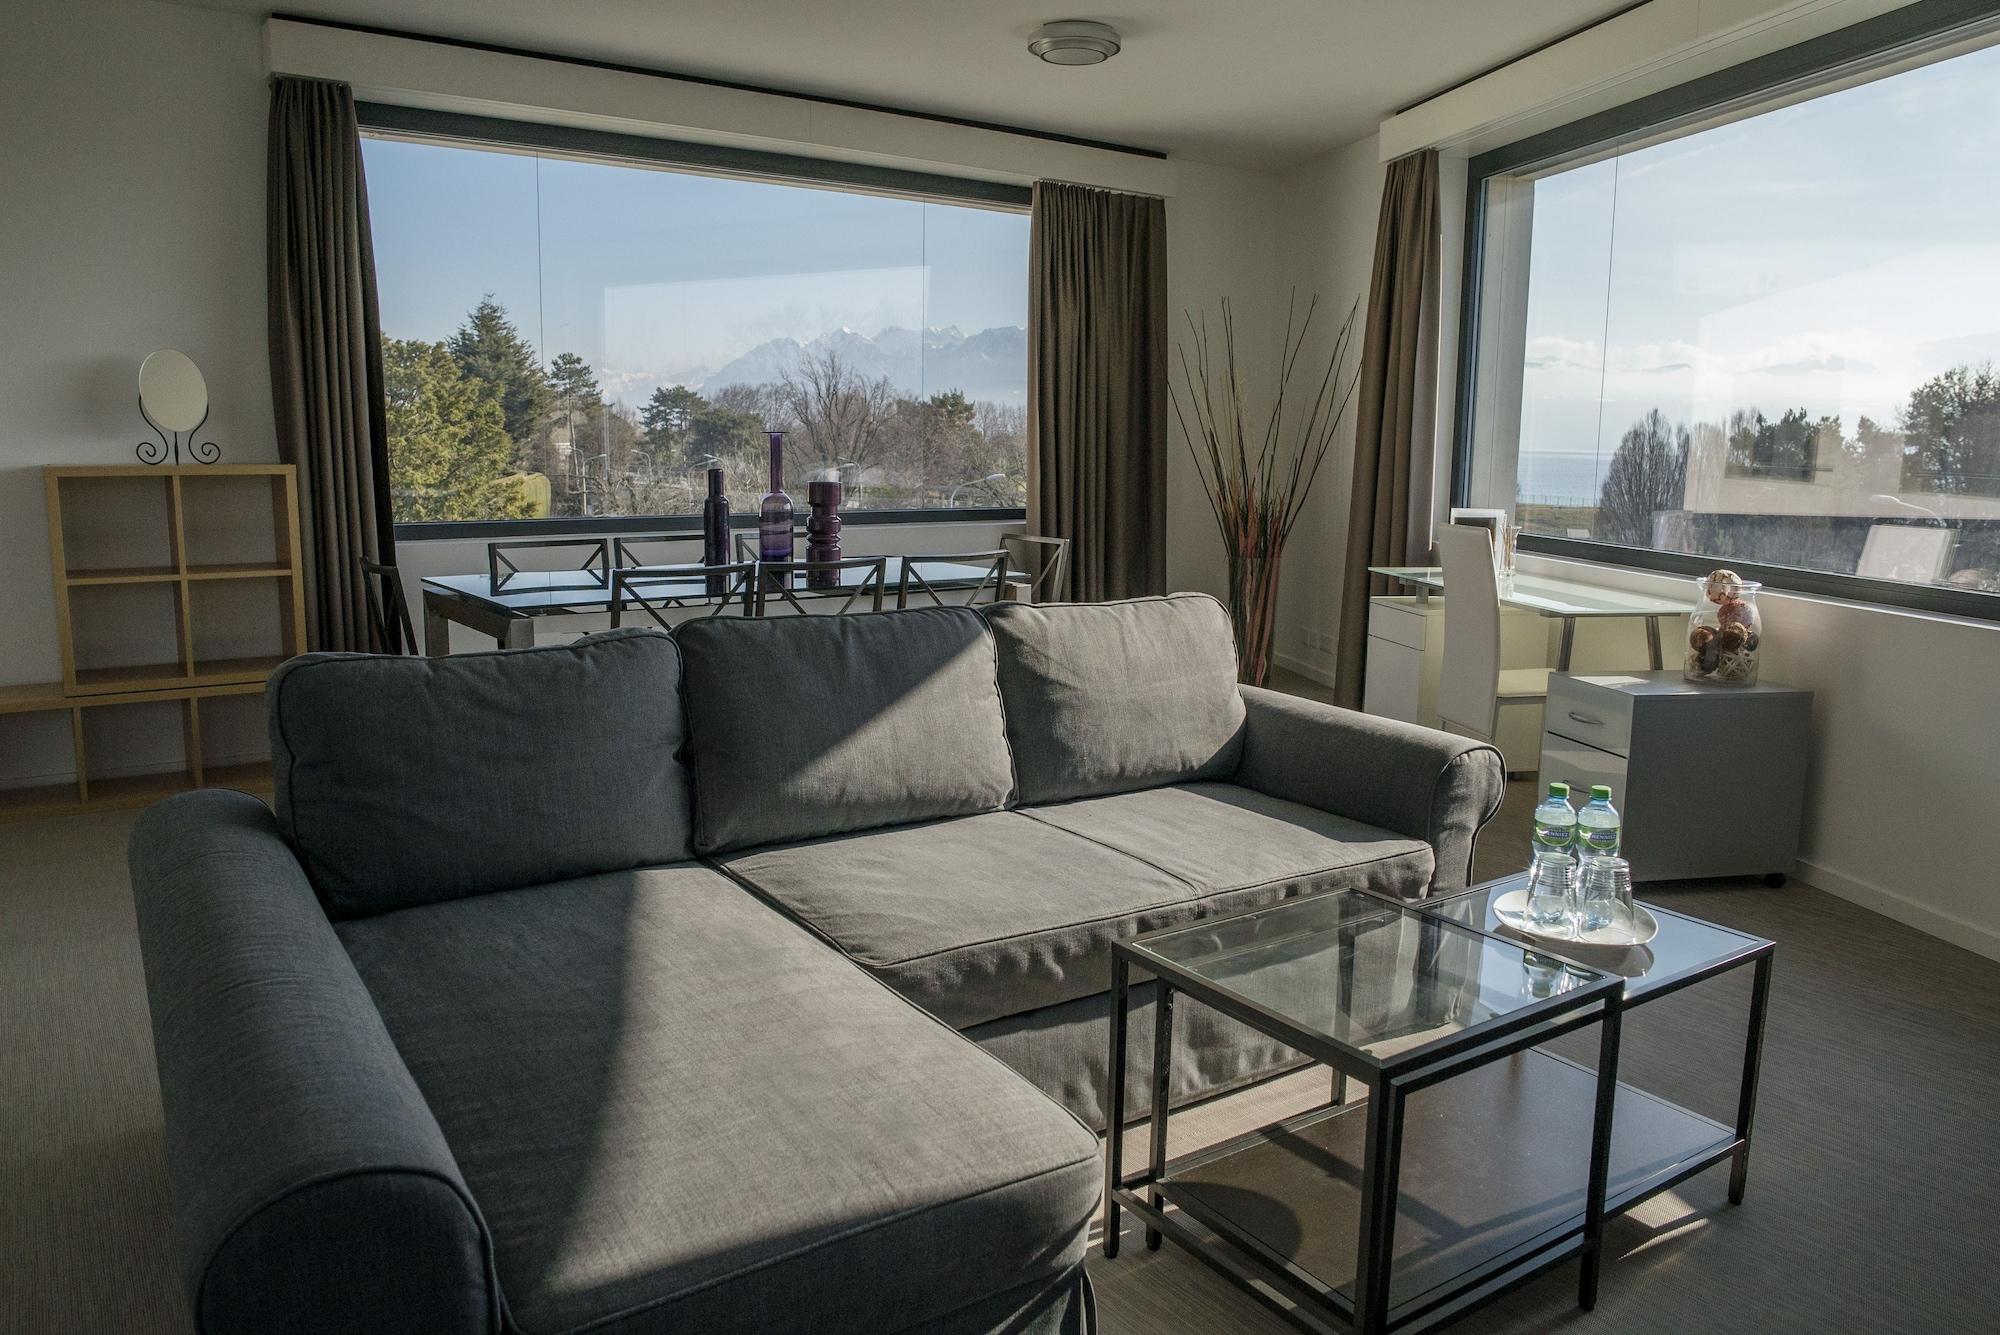 Appart'Hotel 46a, Lausanne